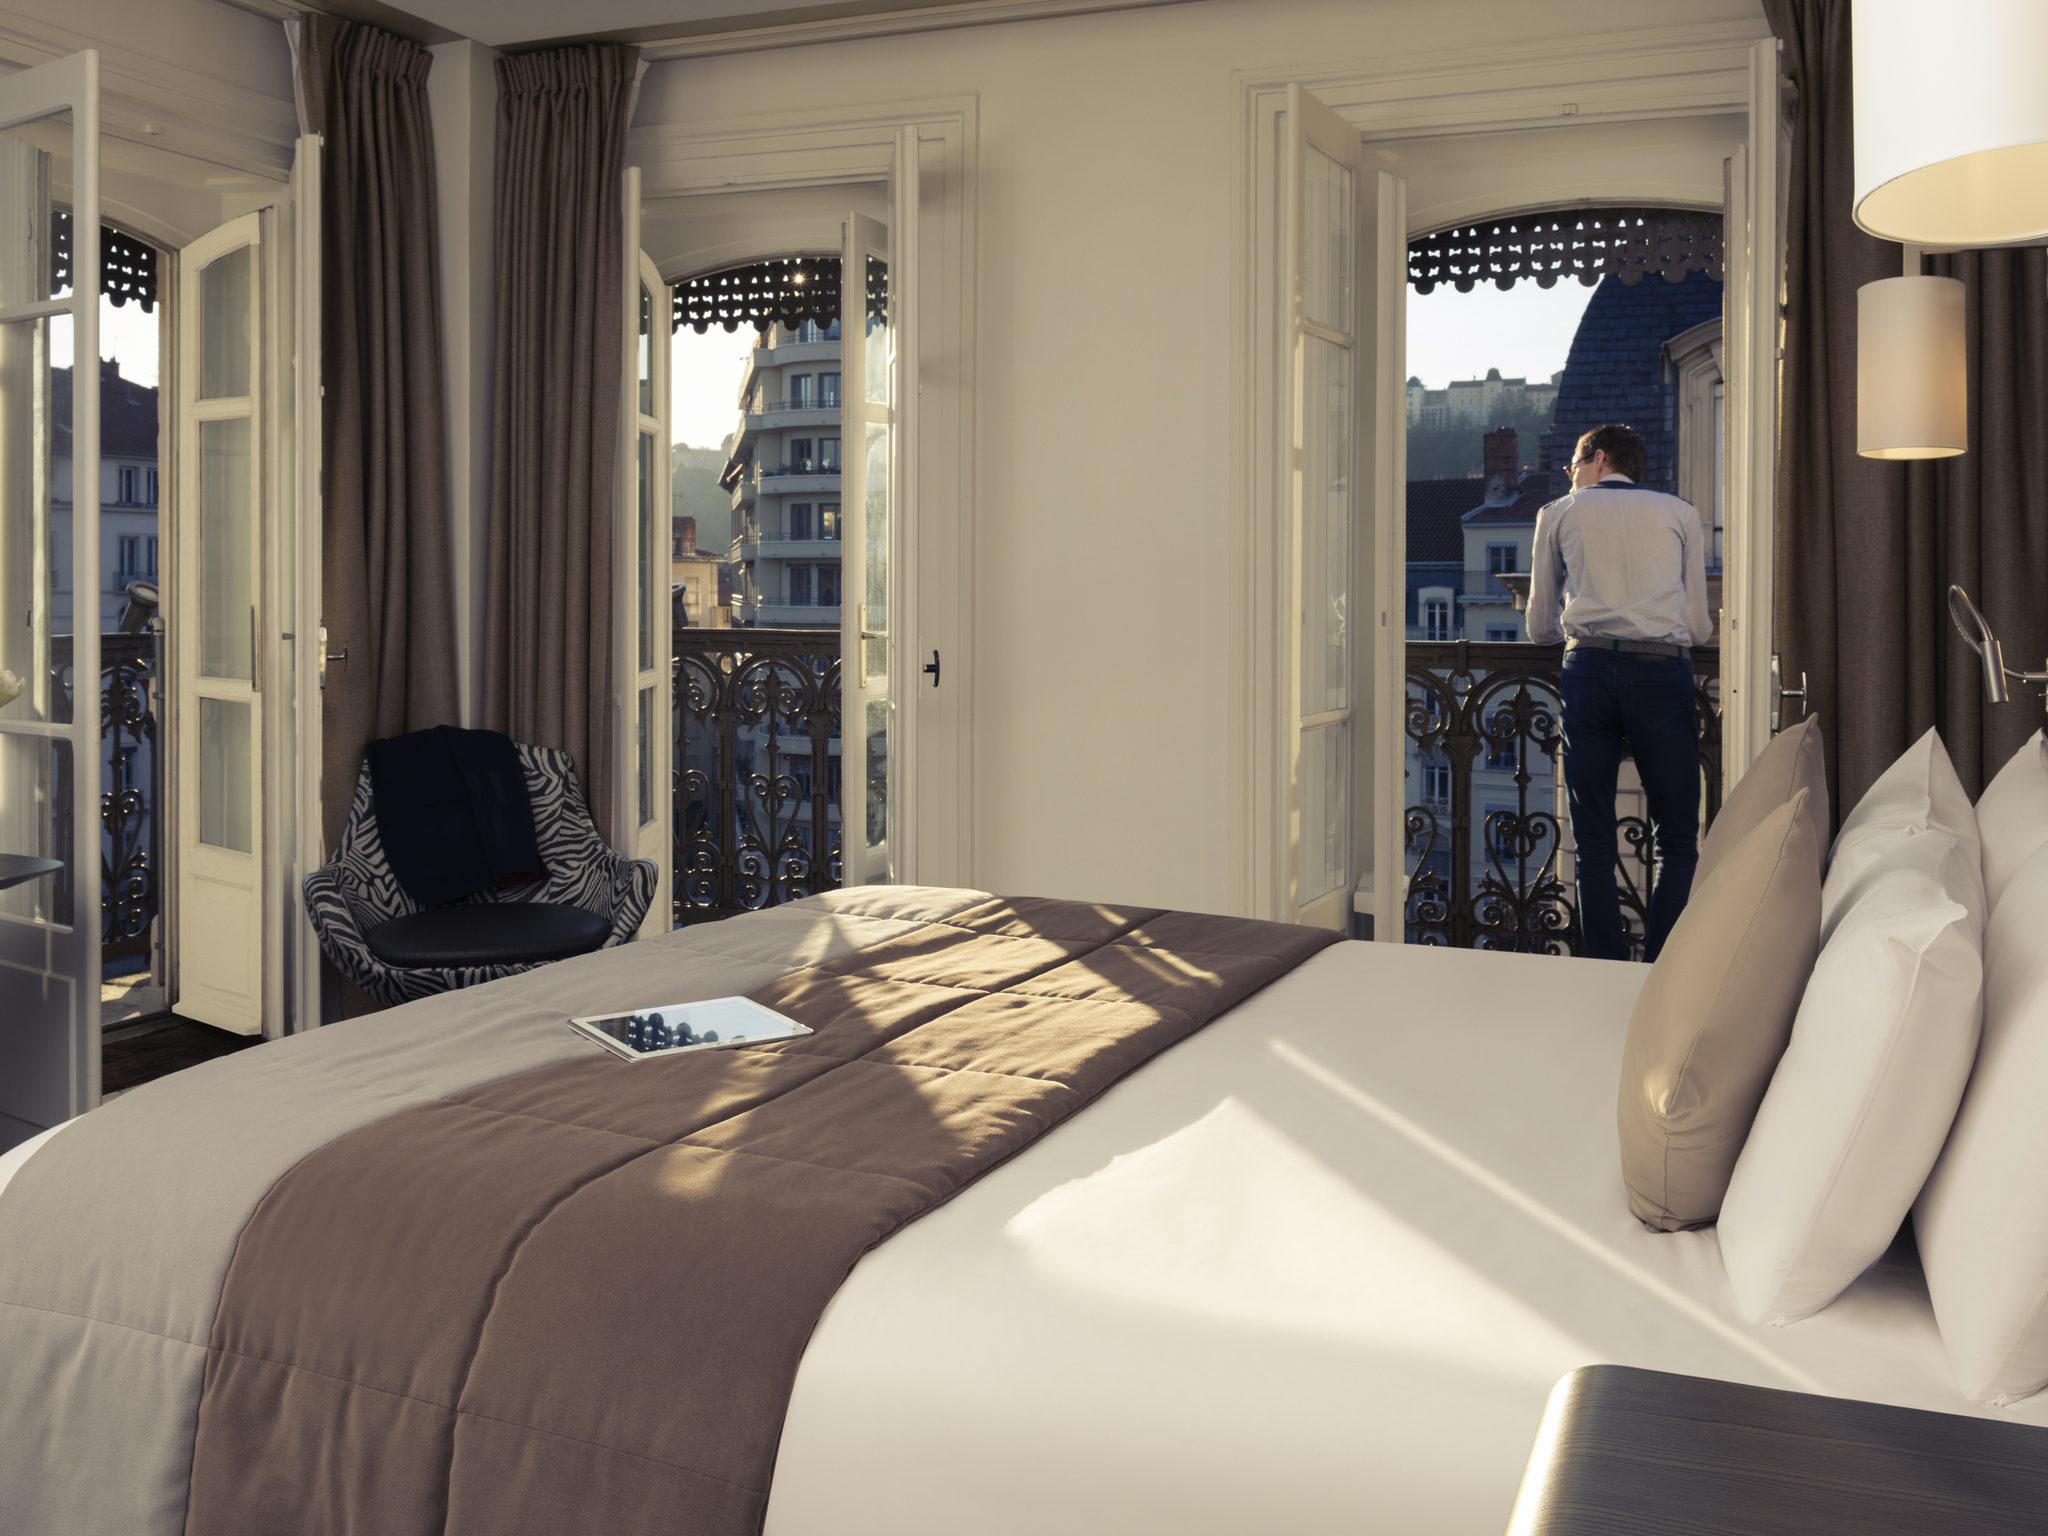 فندق - Hôtel Mercure Lyon Centre Beaux-Arts